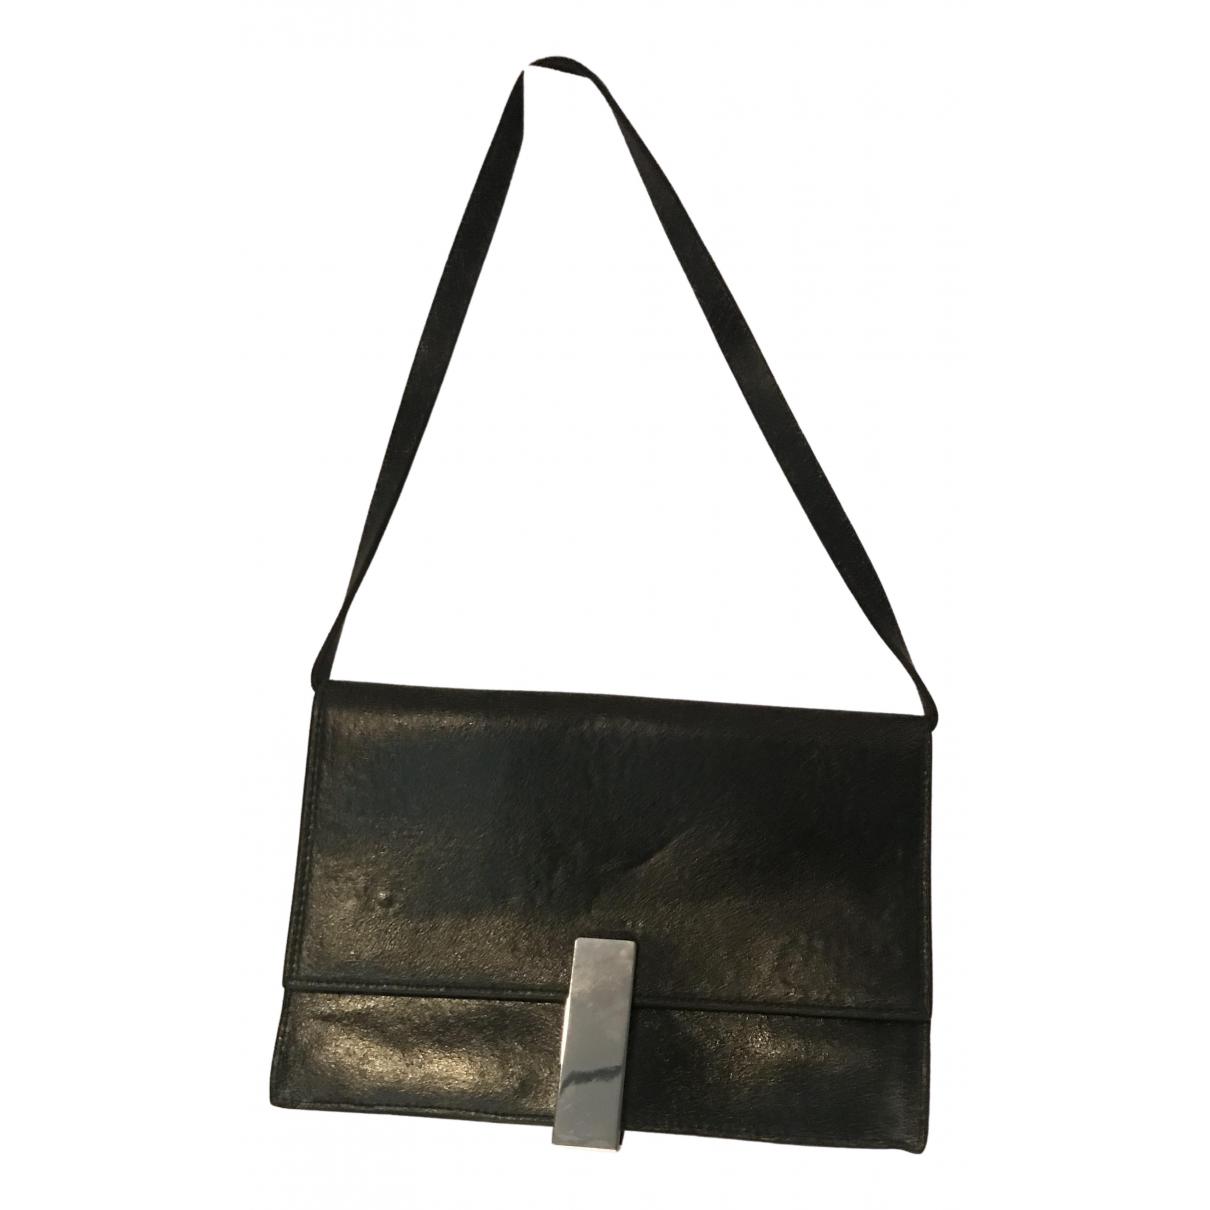 Zara - Sac a main   pour femme en cuir - noir